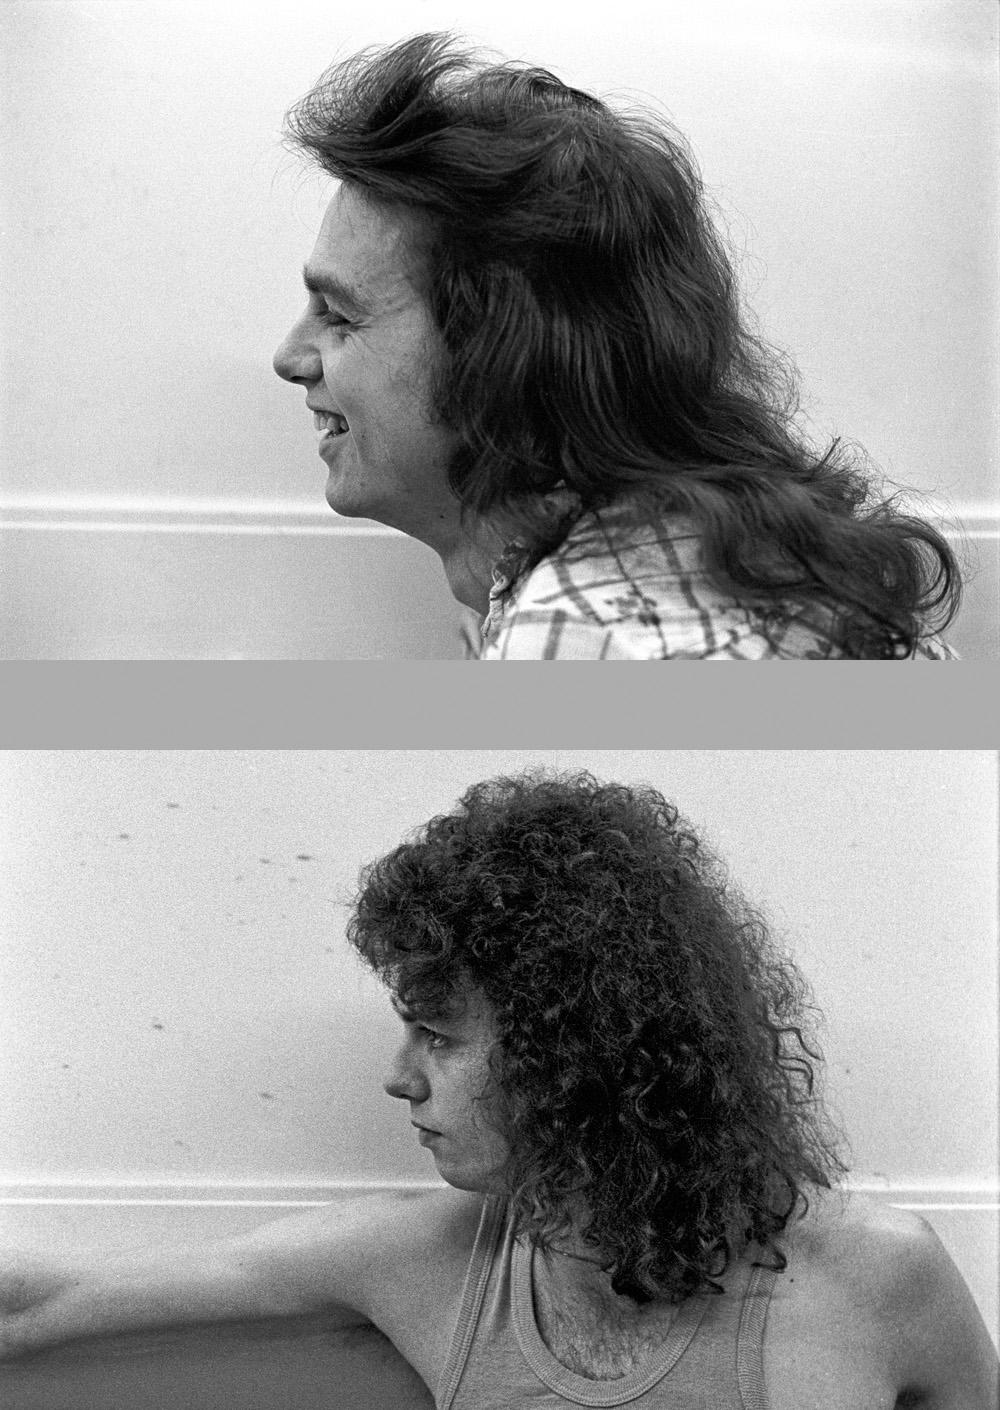 Steve Biller, Lorton, Virginia - May 1976   Before and After Haircut